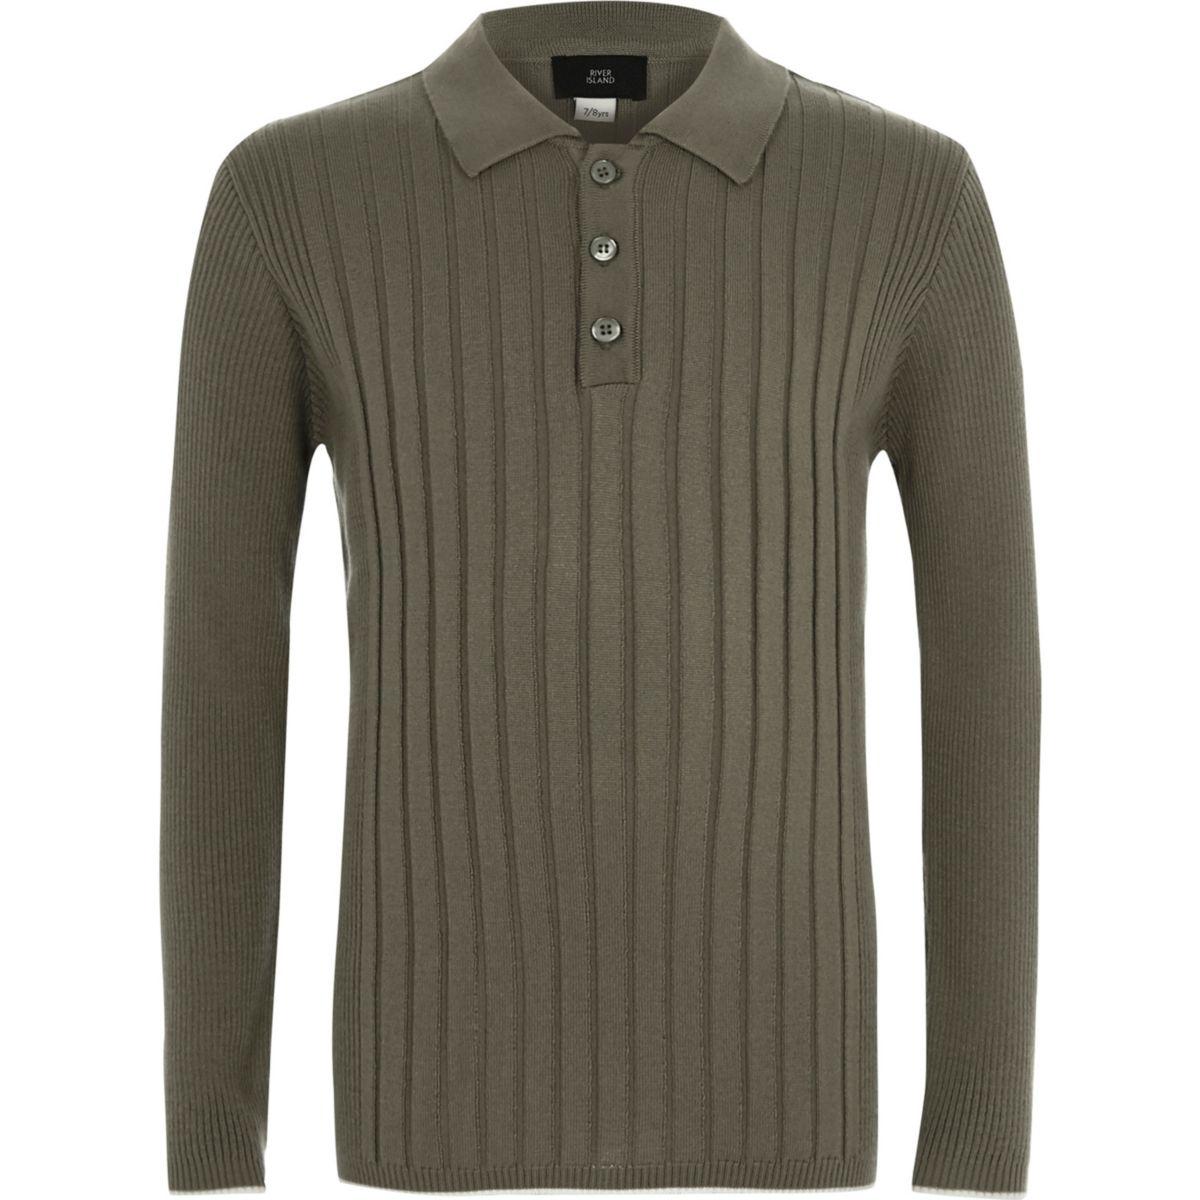 Boys khaki ribbed long sleeve polo shirt - Polo Shirts - boys